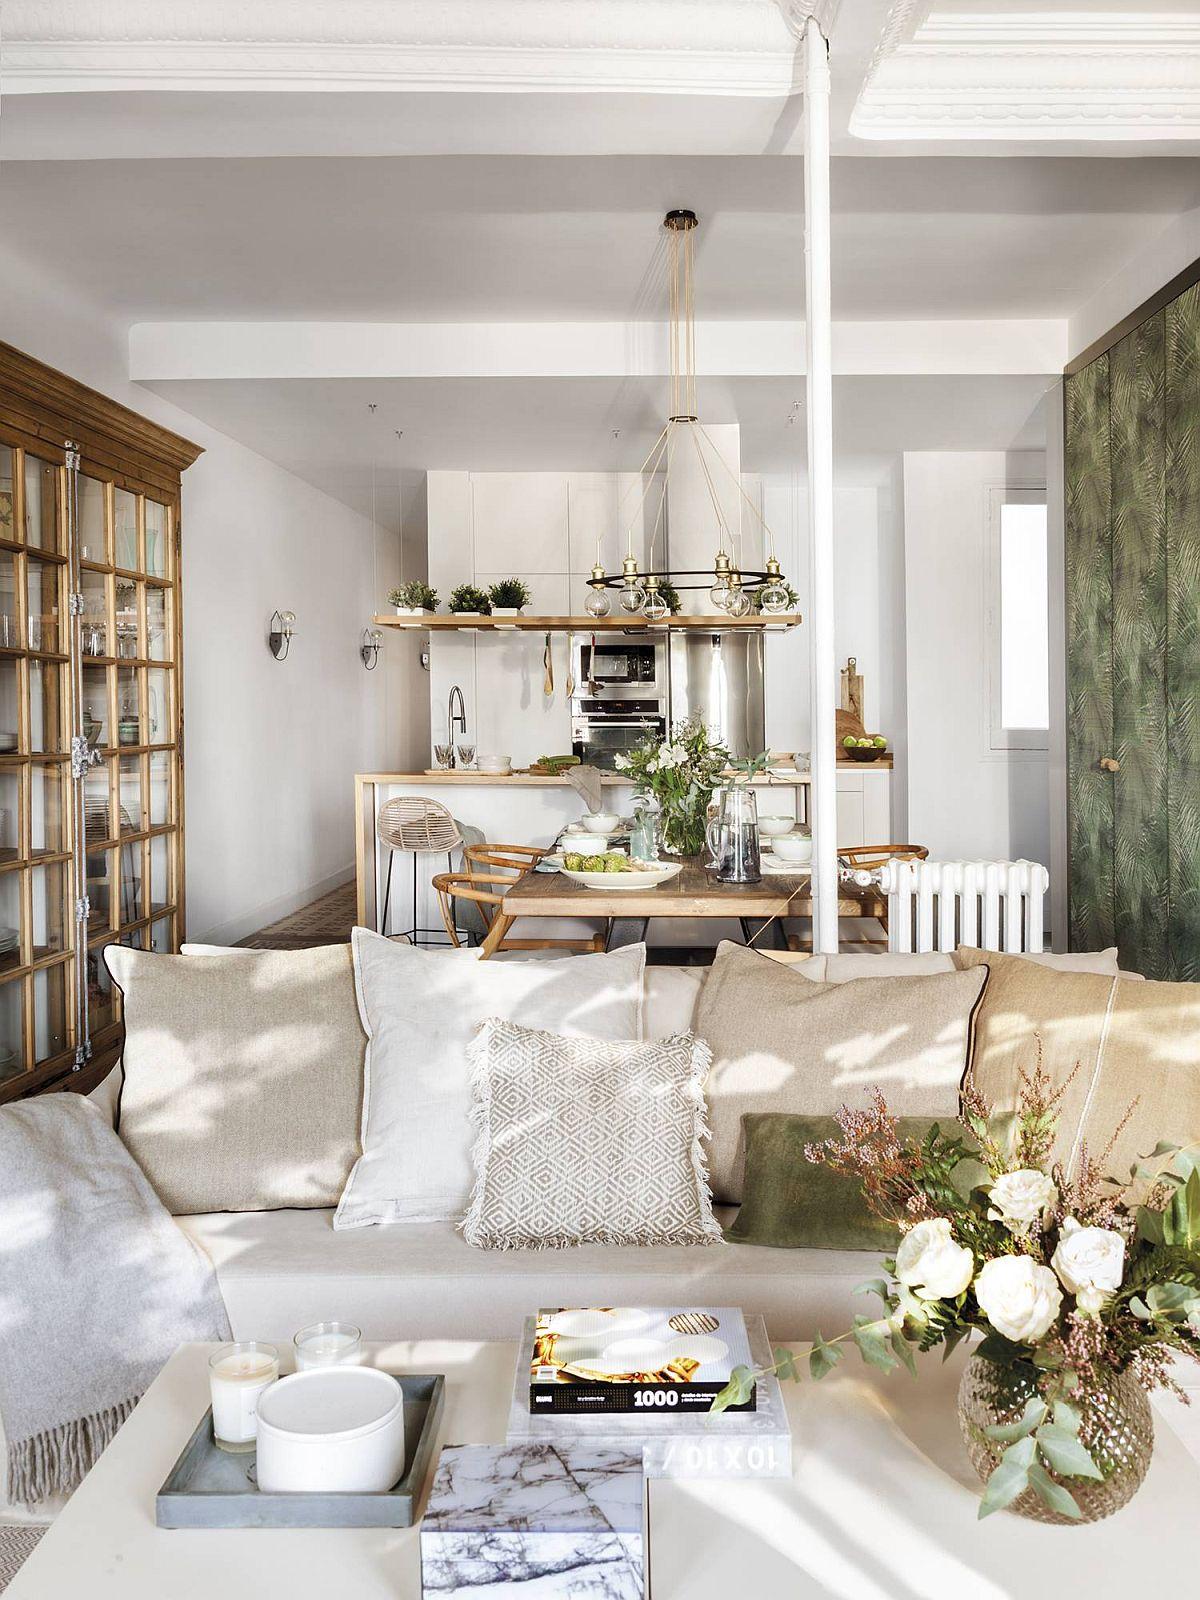 adelaparvu.com despre amenajare apartament in stil urban jungle, design Hoc Volo, Foto Javier Bravo si Felipe Schefell (18)